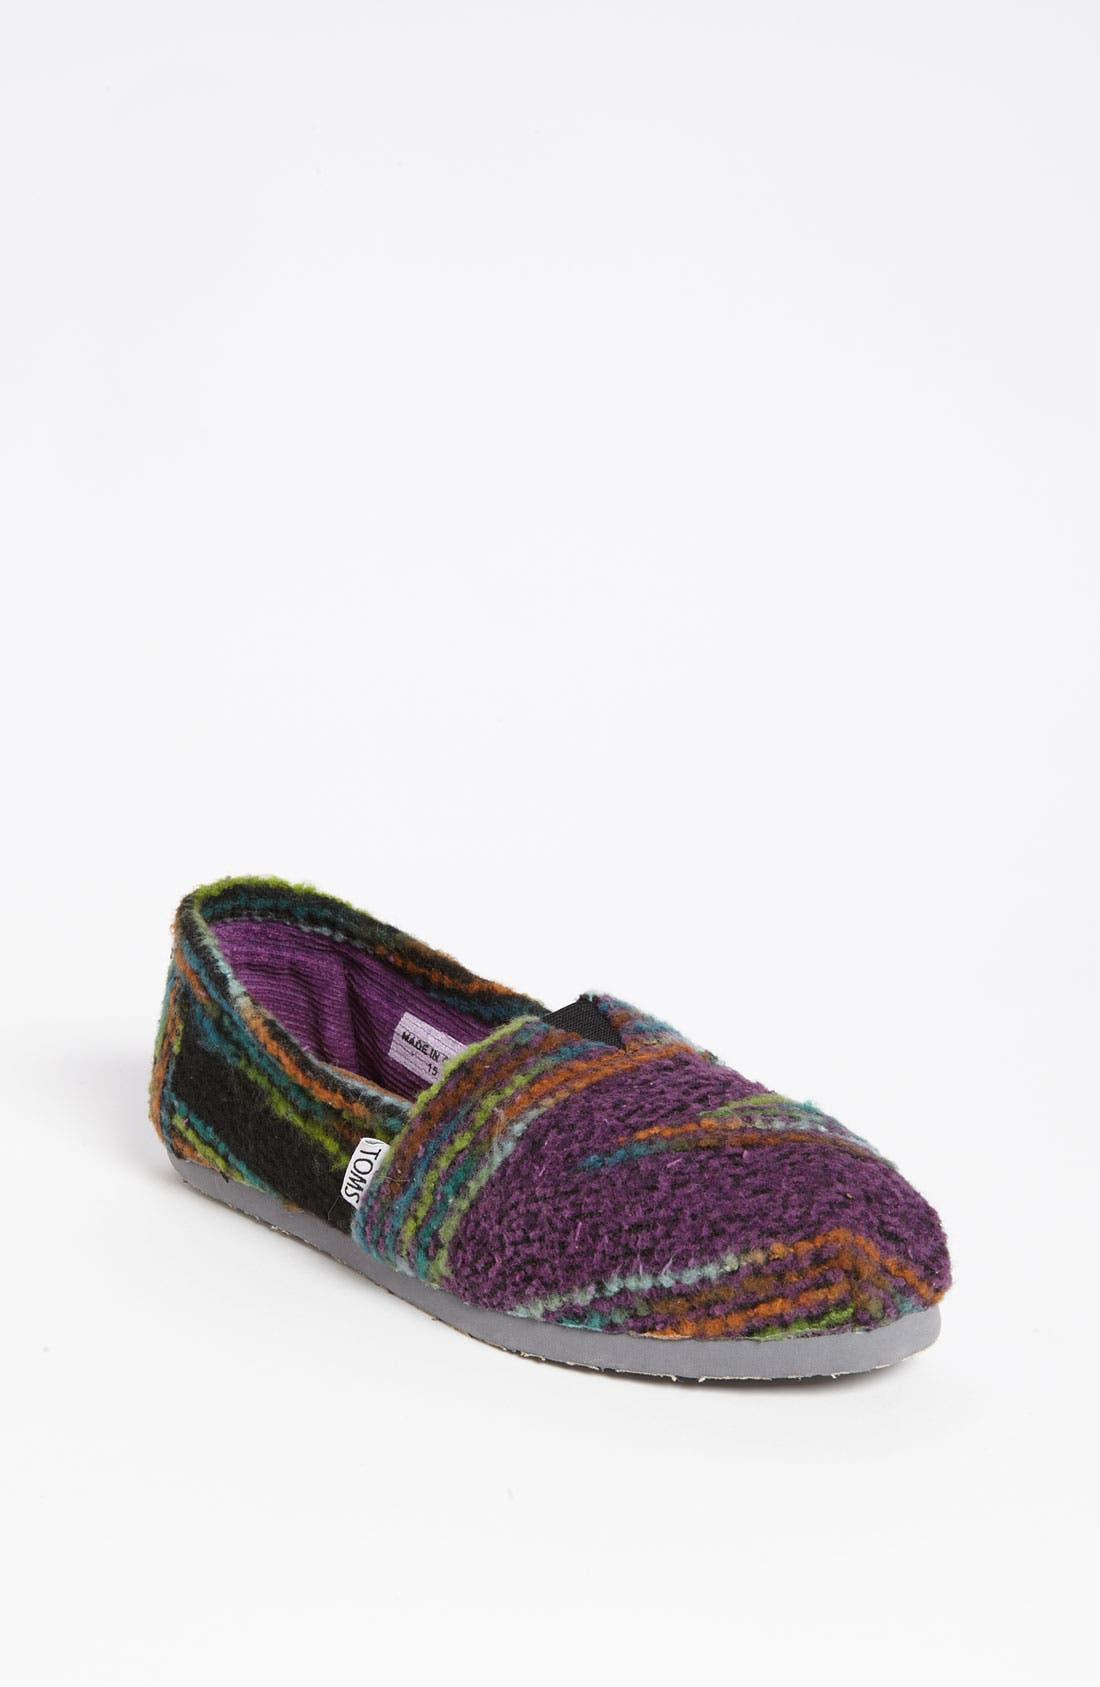 Alternate Image 1 Selected - TOMS 'Classic - Stripe' Woolen Slip-On (Women)